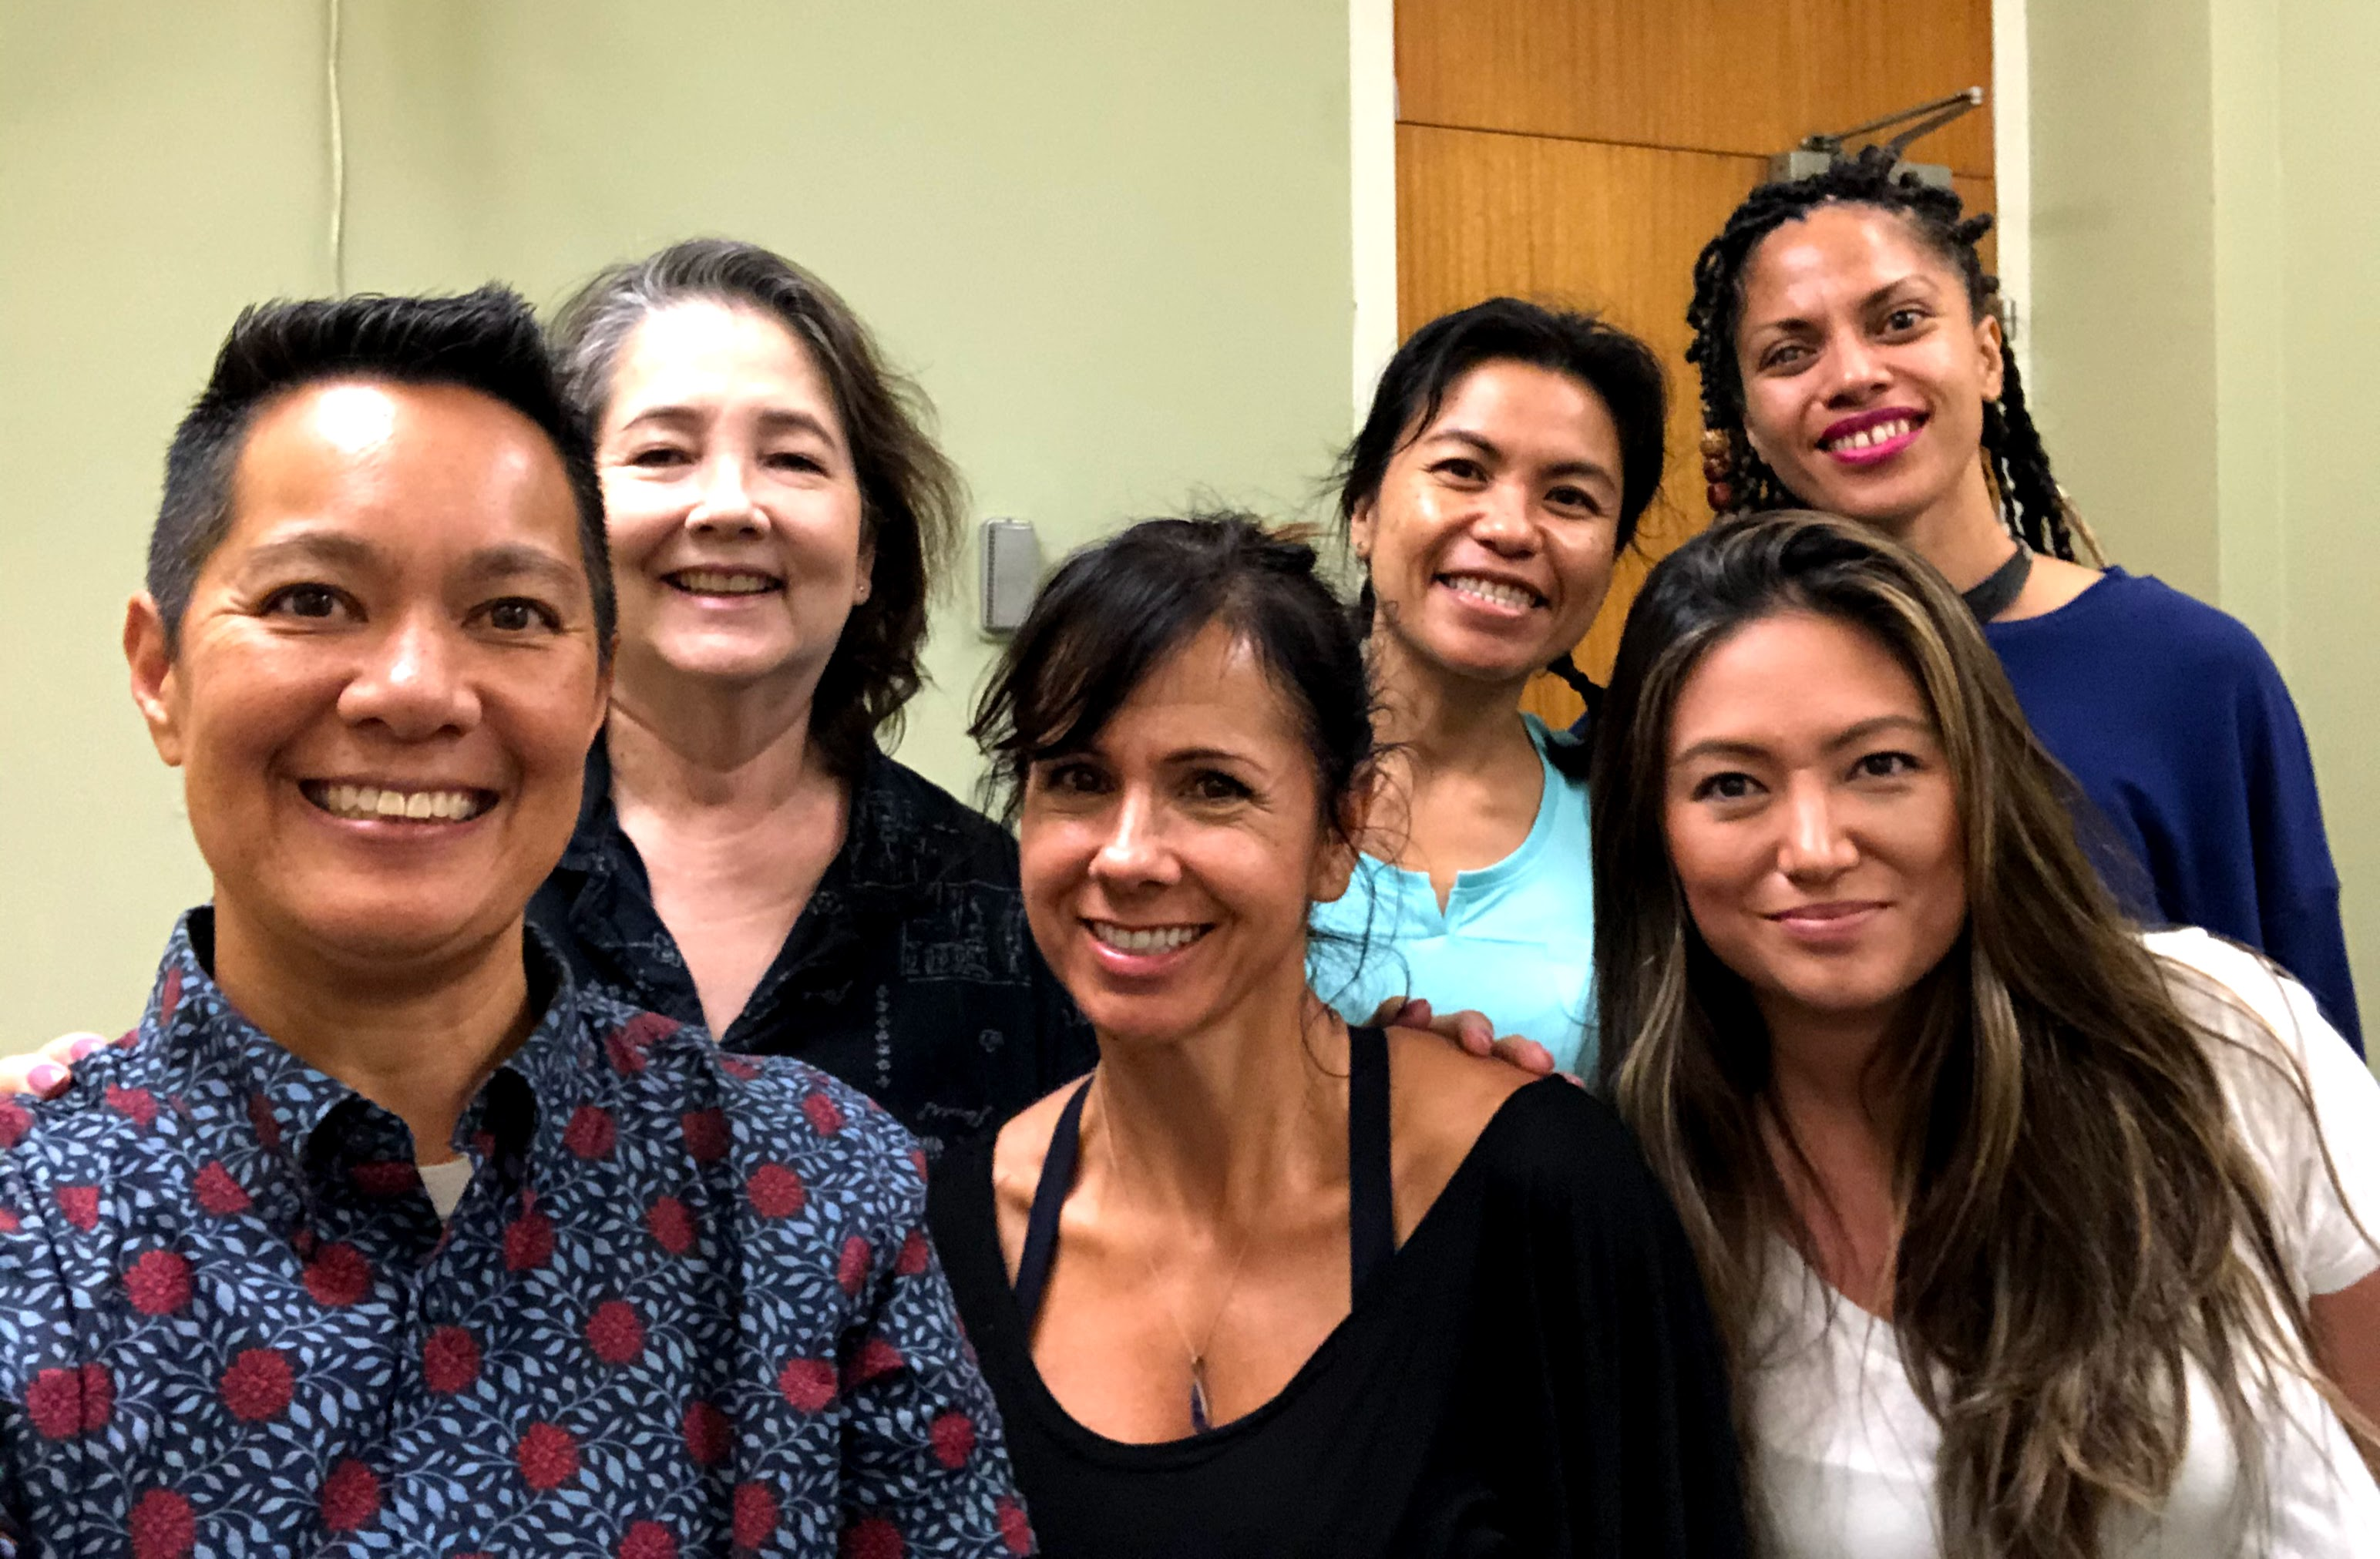 Dr. Chris Lipat teaches Reiki in Honolulu